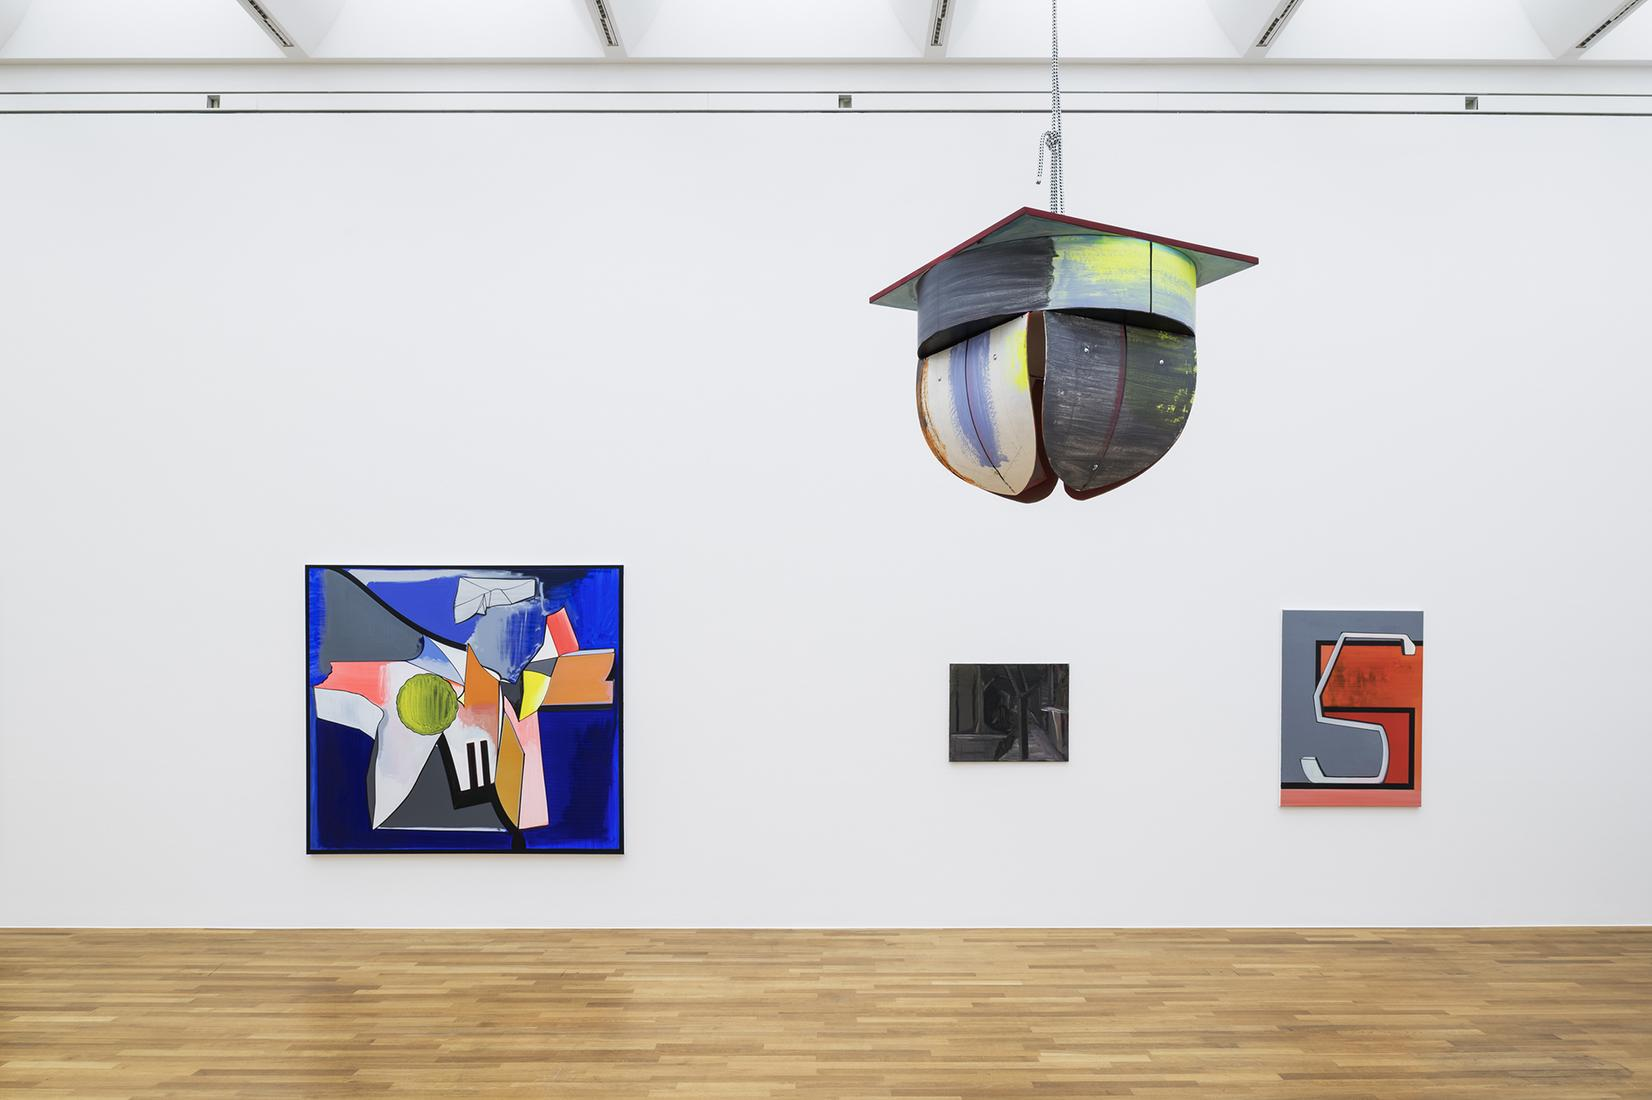 February 1 — April 29, 2018 - Kunstmuseum Bonn, Germany - THOMAS SCHEIBITZ: MASTERPLAN\KINO -  - Exhibitions